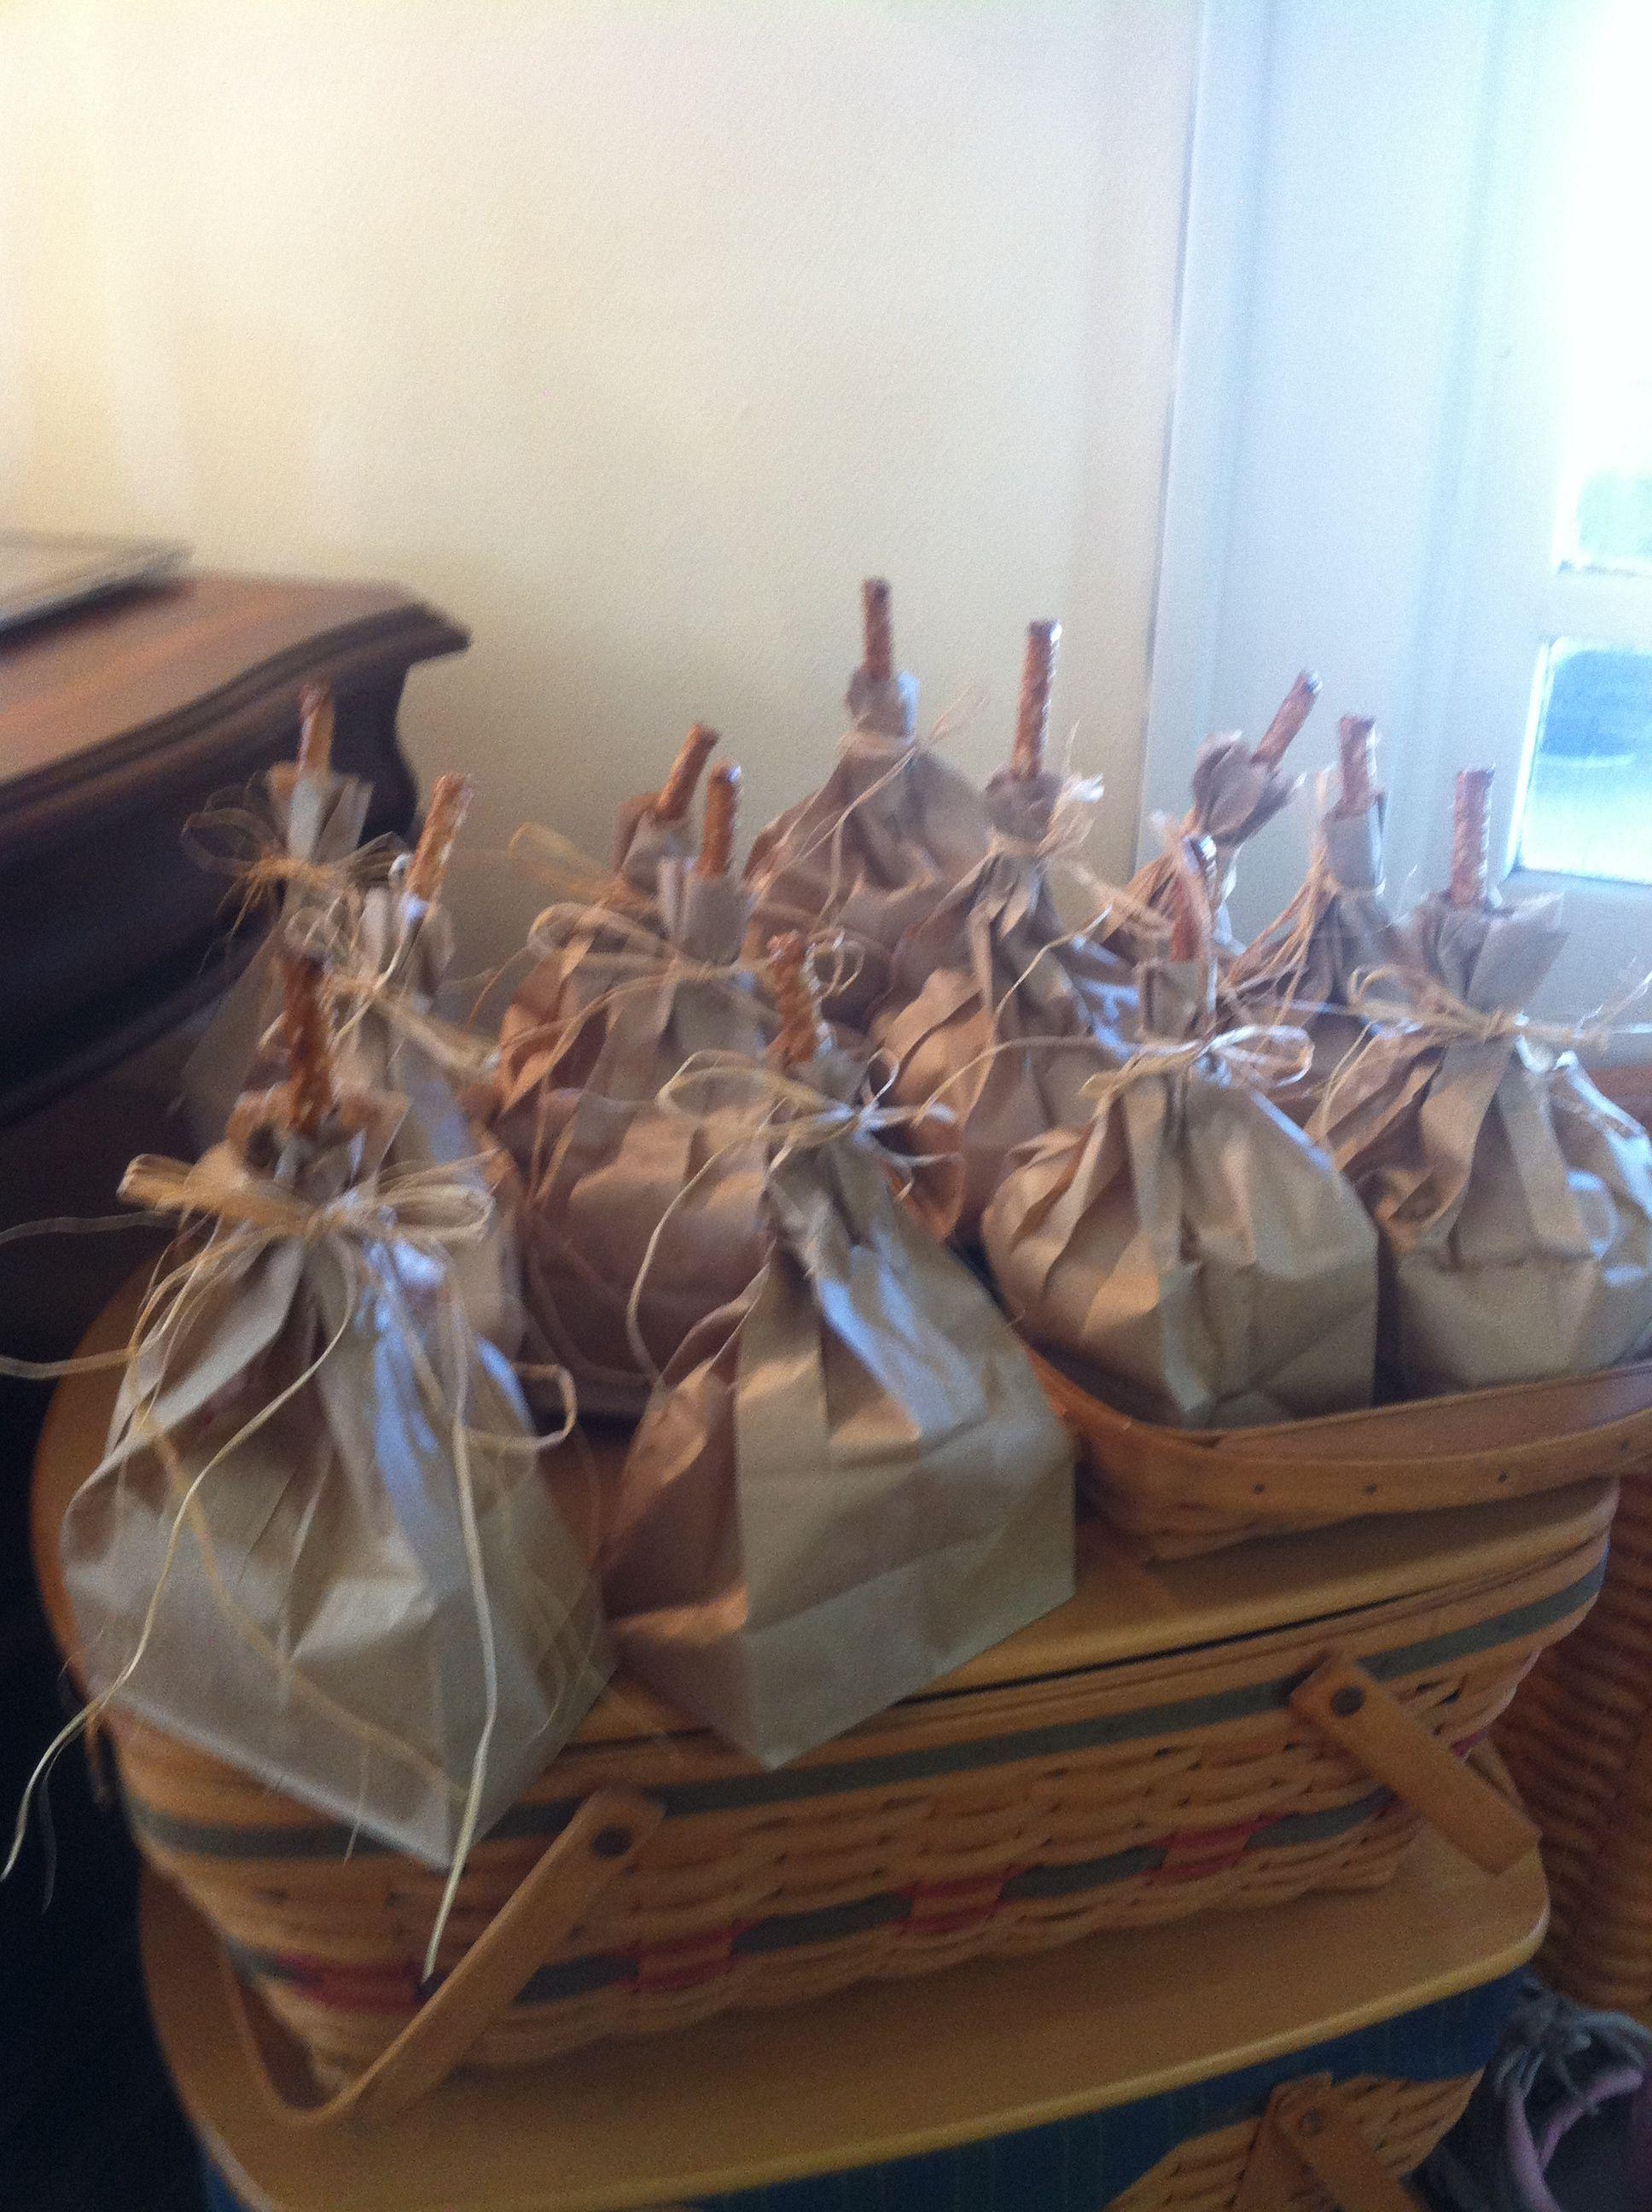 Quidditch broom popcorn bags Quidditch brooms, Harry